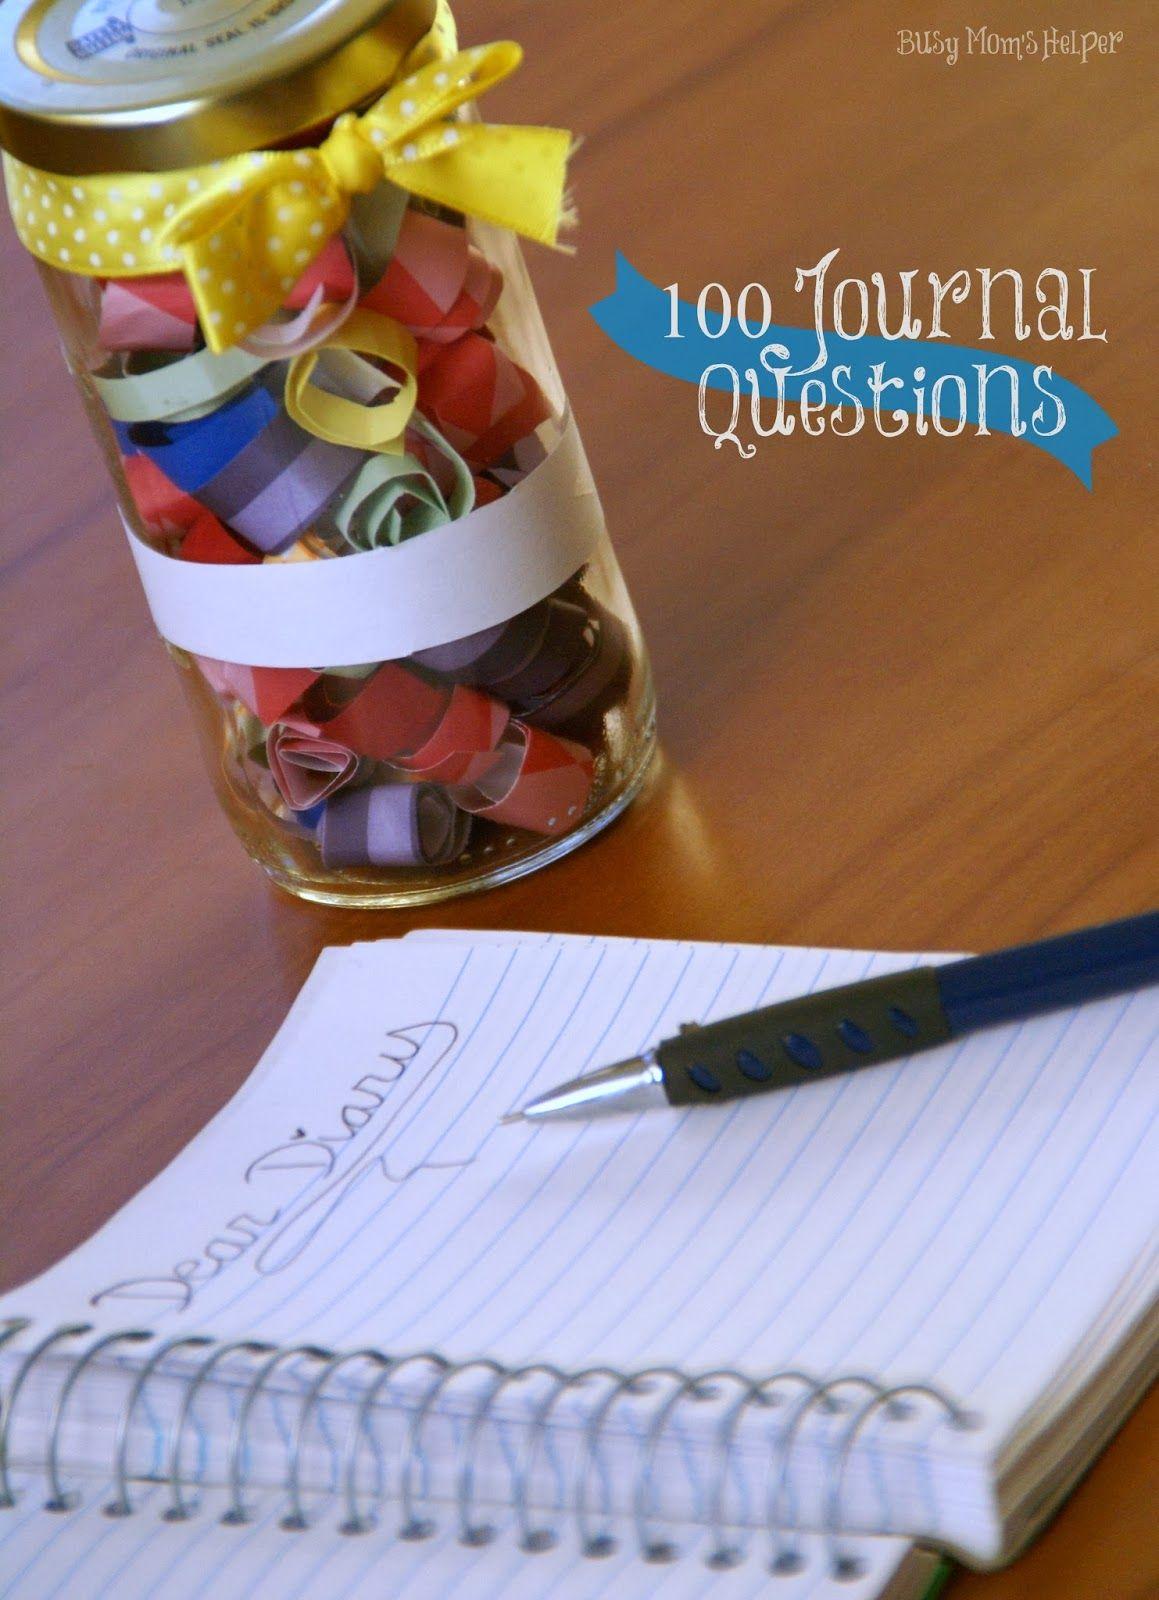 100 Journal Questions